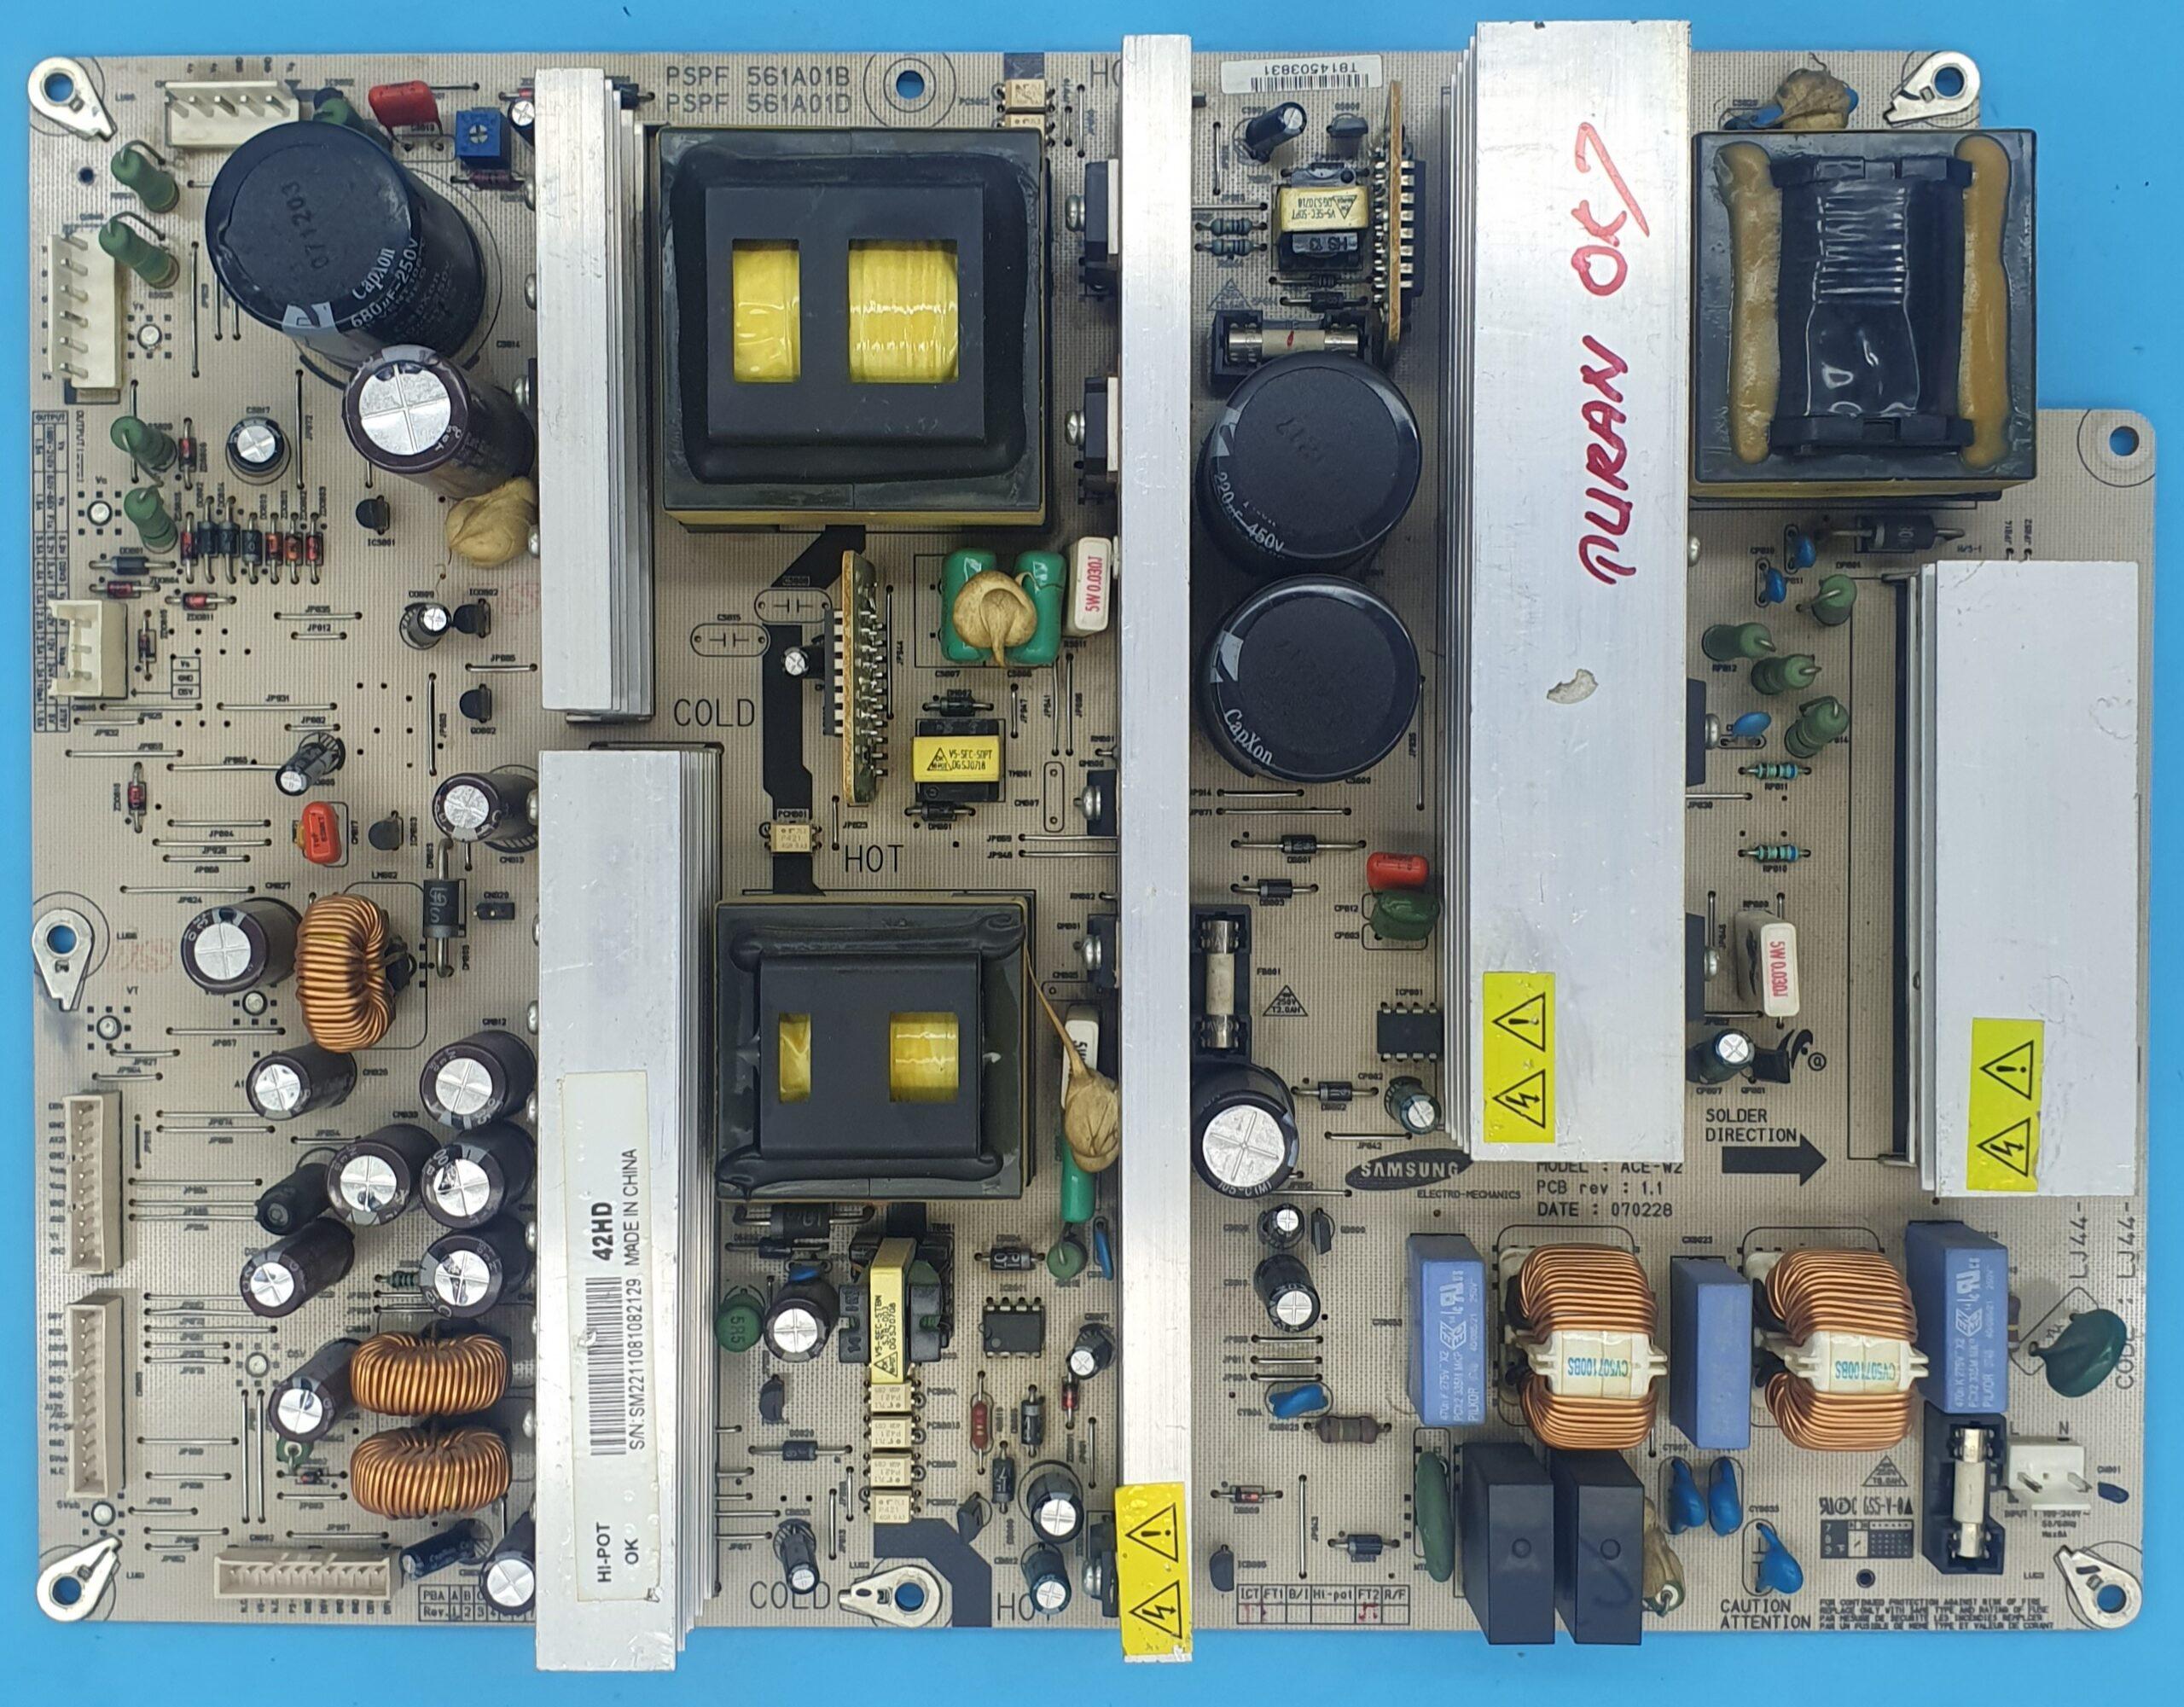 PSPF-561A01B Samsung Power (KDV DAHİL = 150 TL)